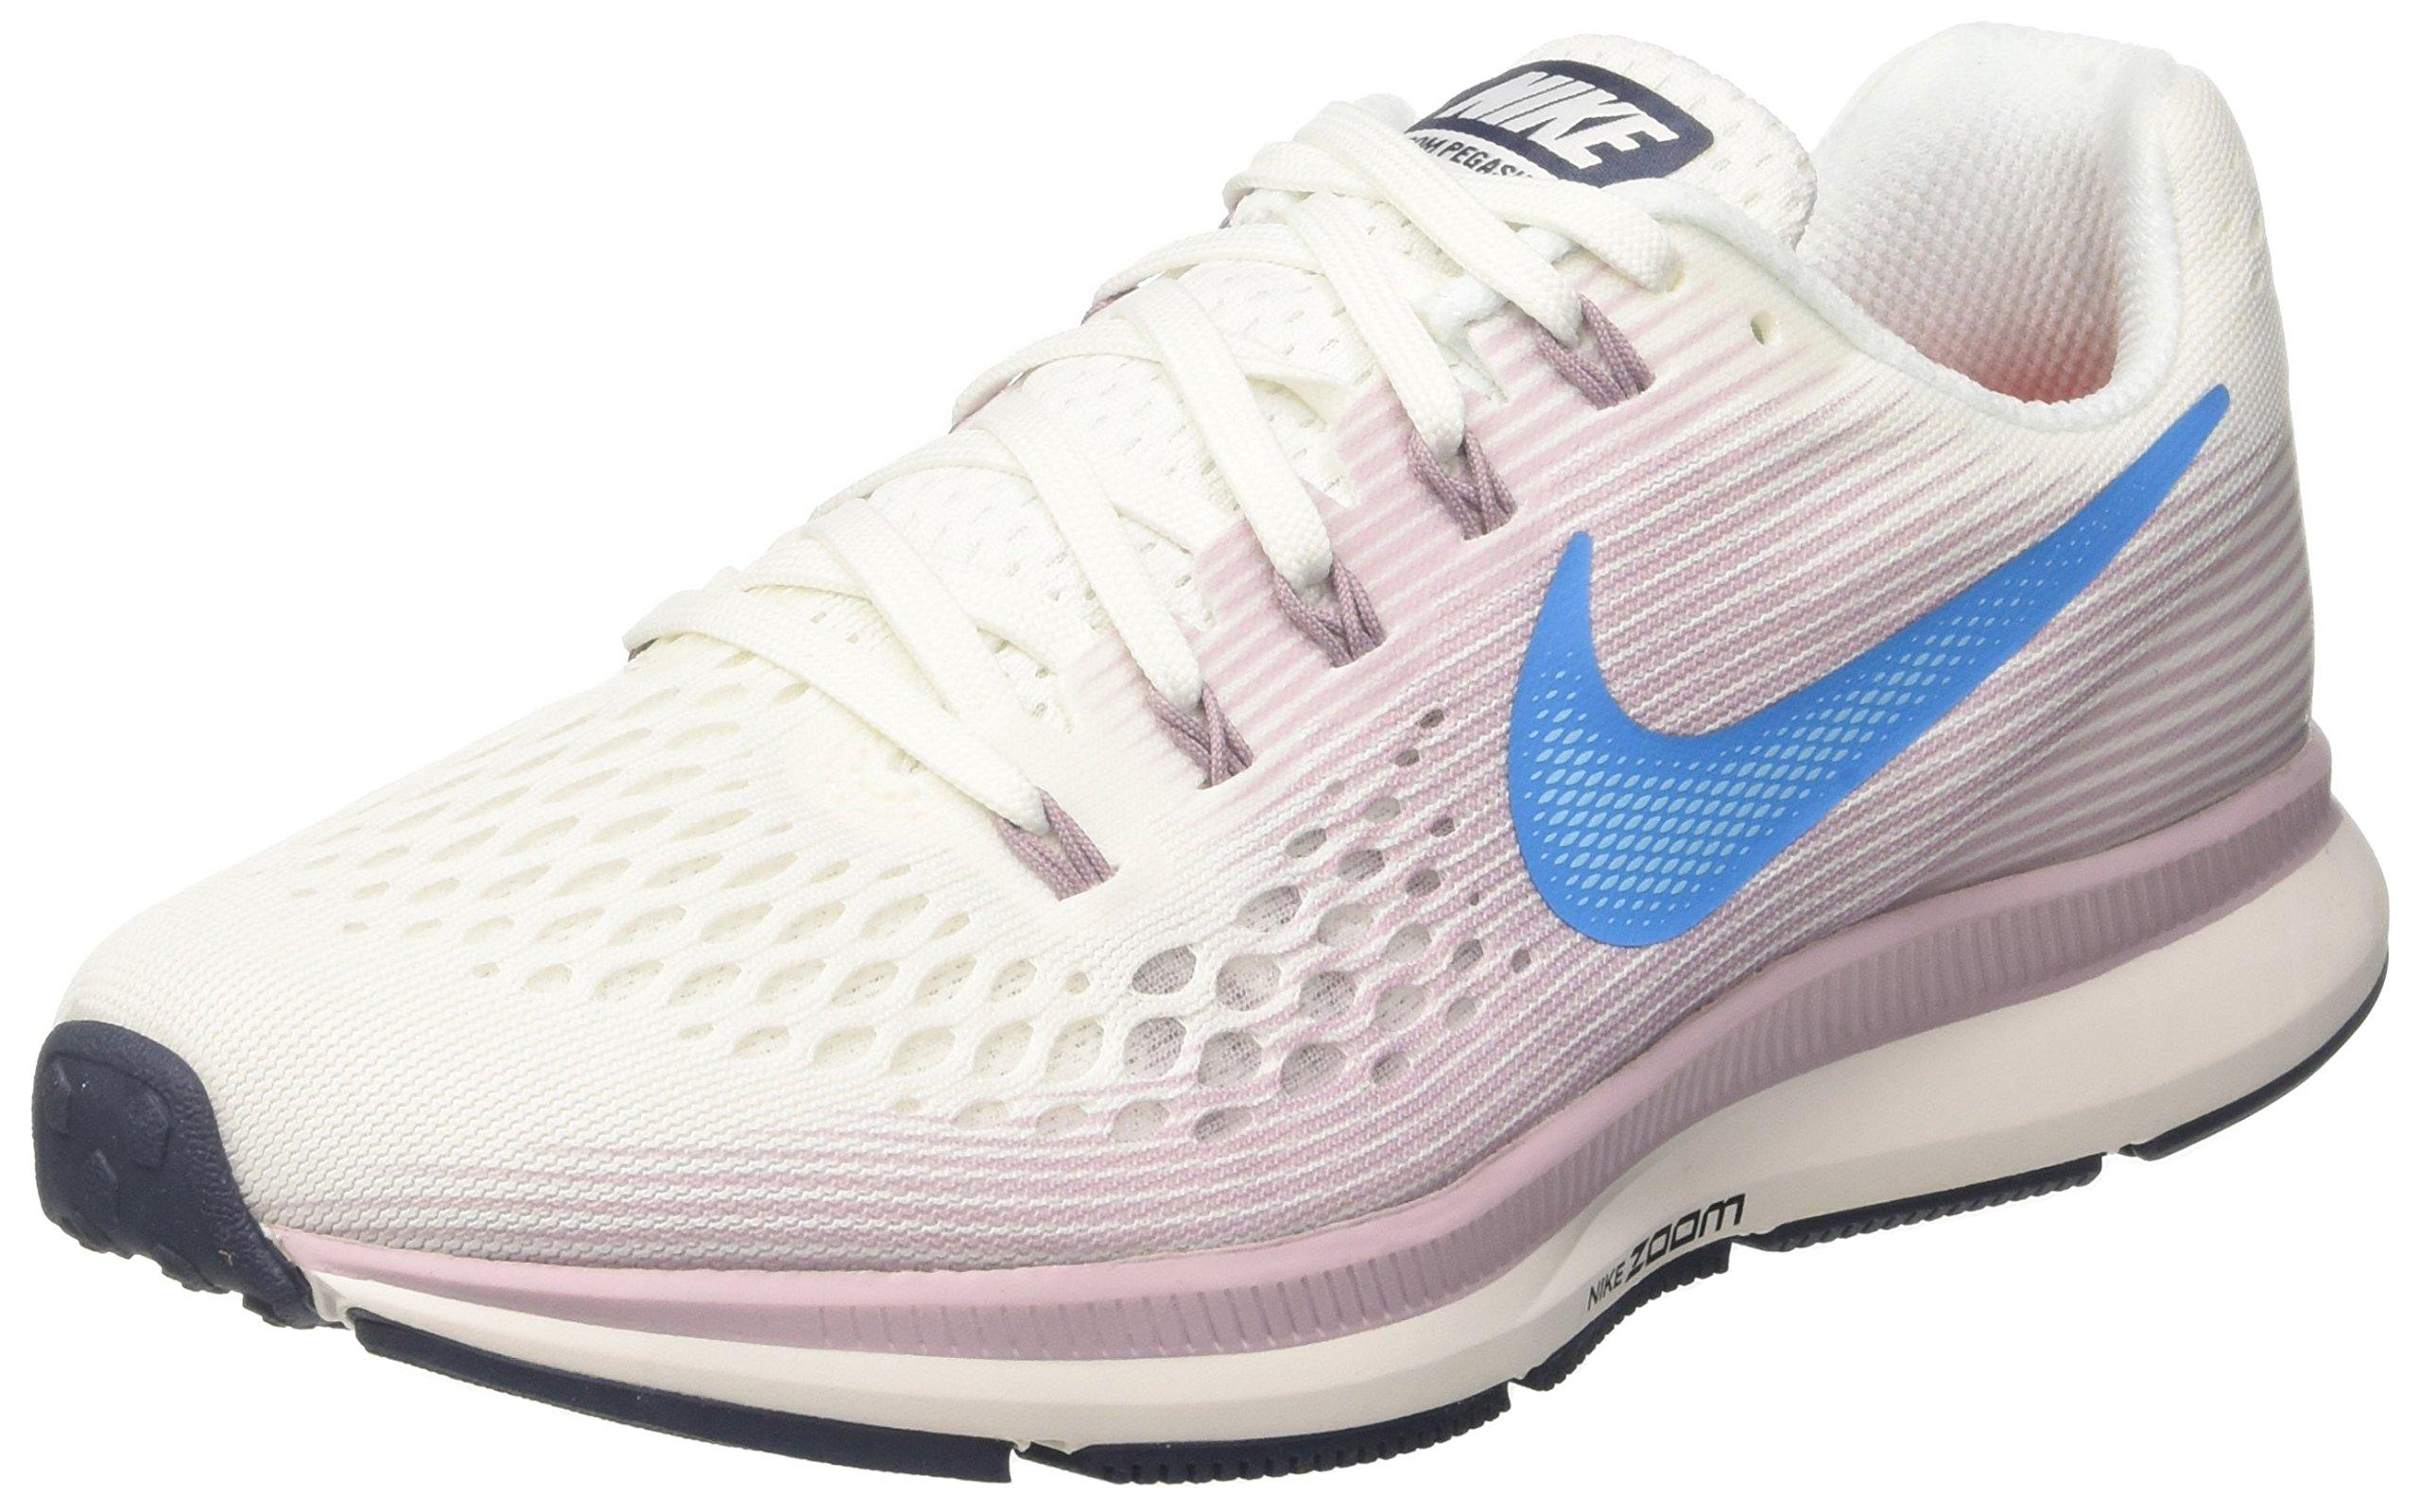 Nike WMNS Air Zoom Pegasus 34 880560-105 White/Rose/Blue Women's Running Shoes (6.5)